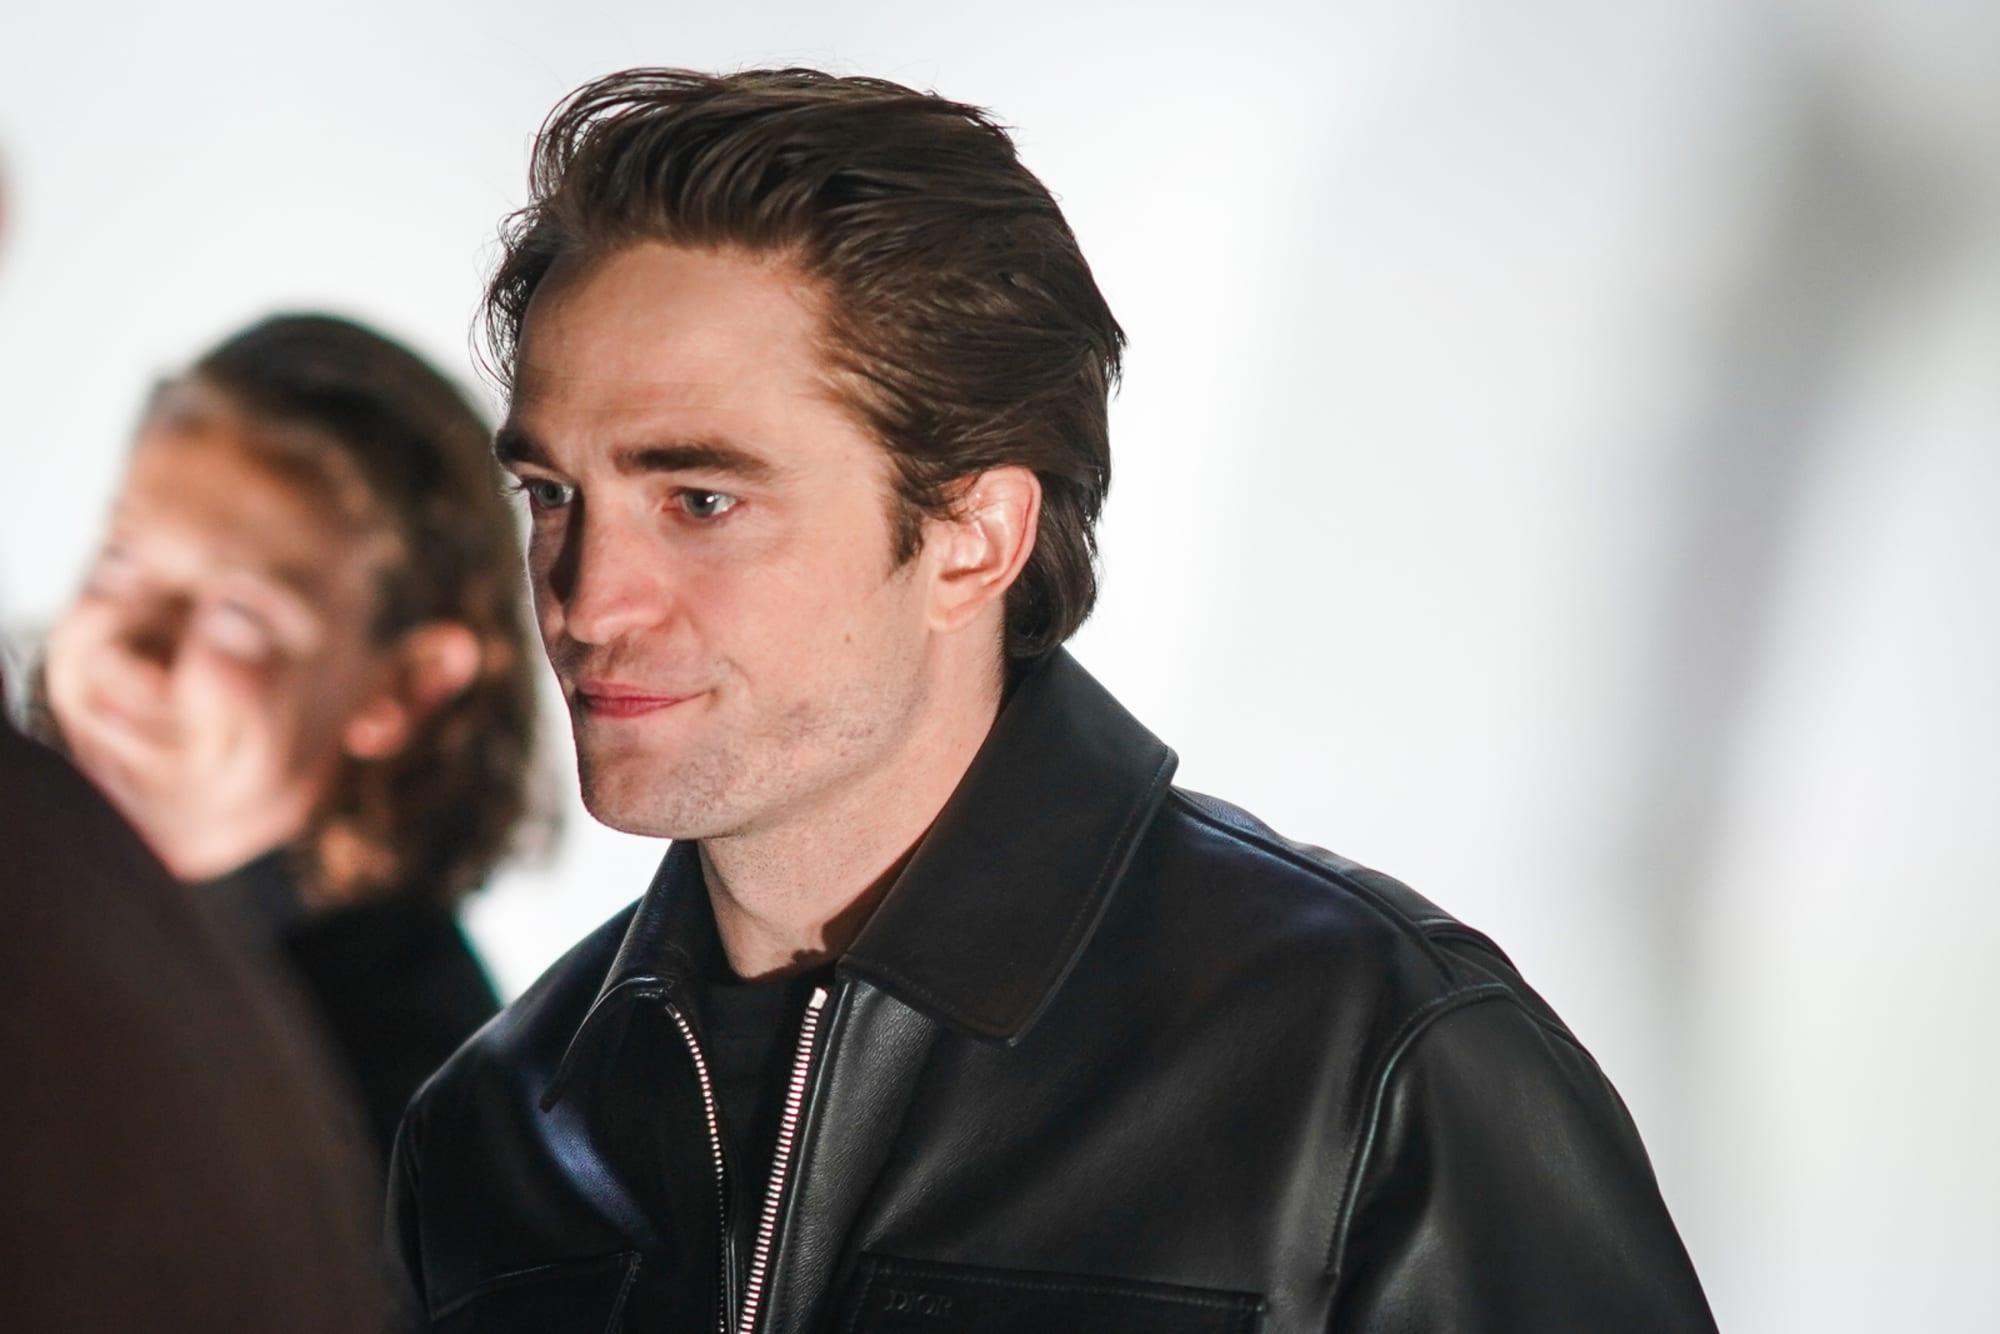 The Batman: Robert Pattinson suits up as The Dark Knight in stunning new teaser